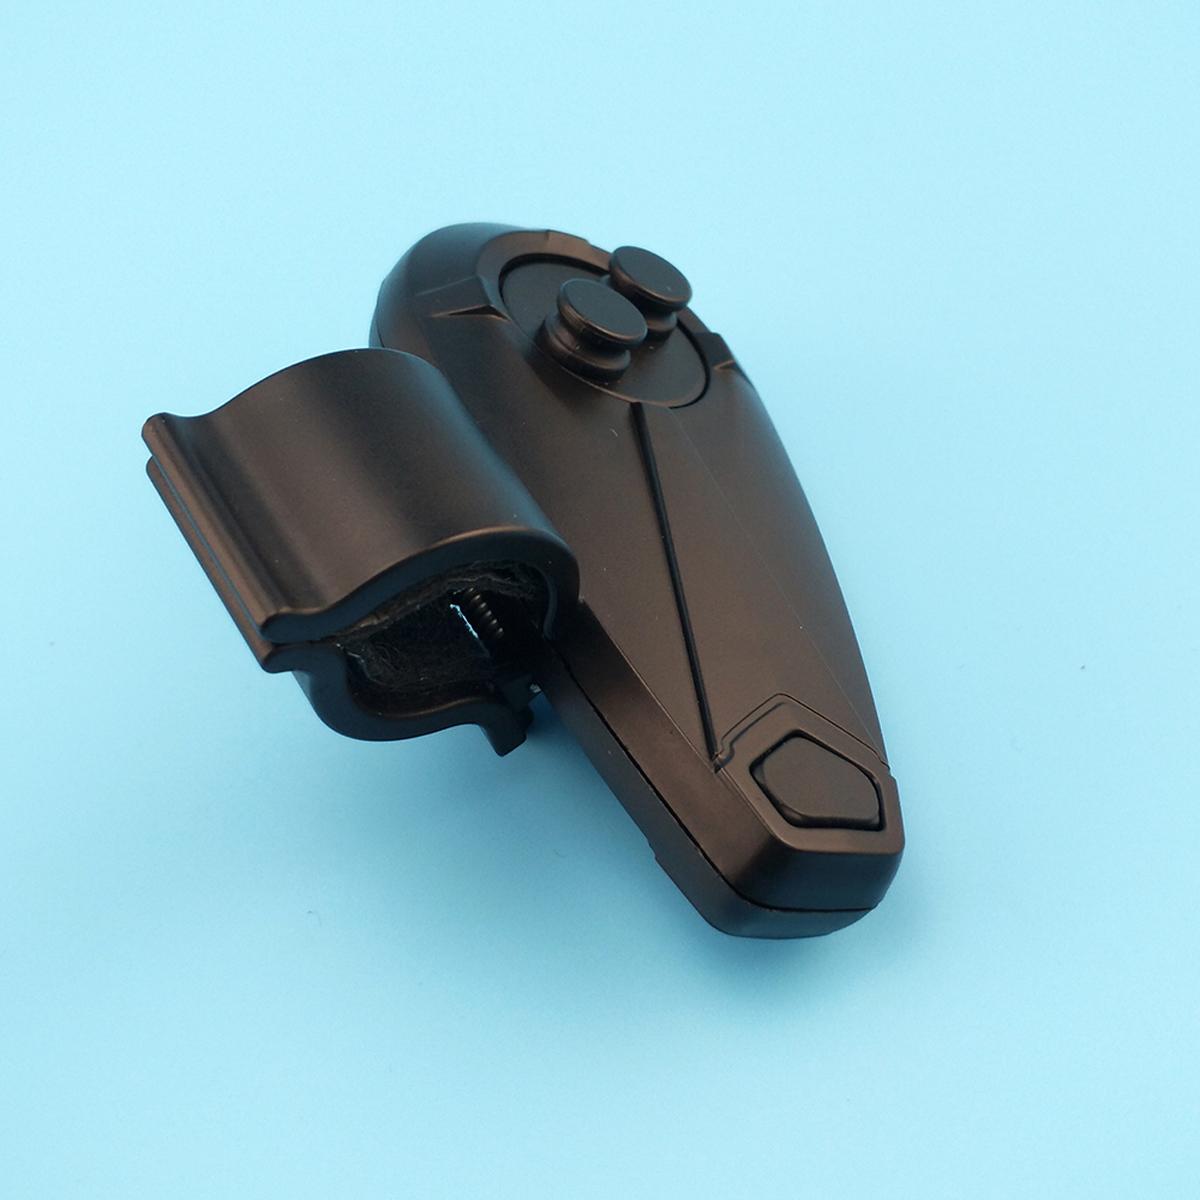 BluetoothЭлектронныйСветодиодныйРыбалкаБудильникBite Sound Alarm Bell ABS Rob Clip Reminder - фото 3